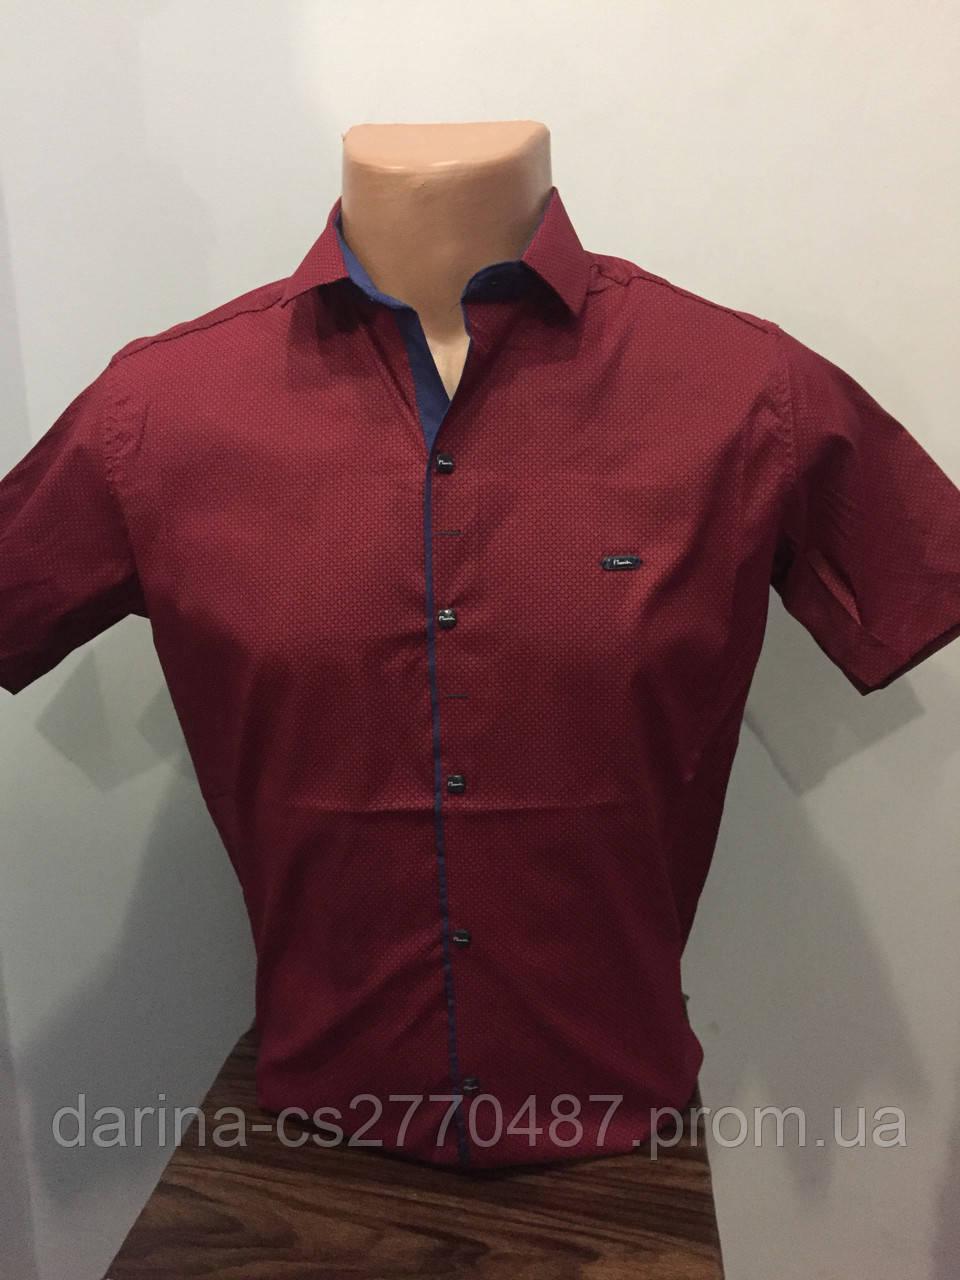 Летняя мужская рубашка S